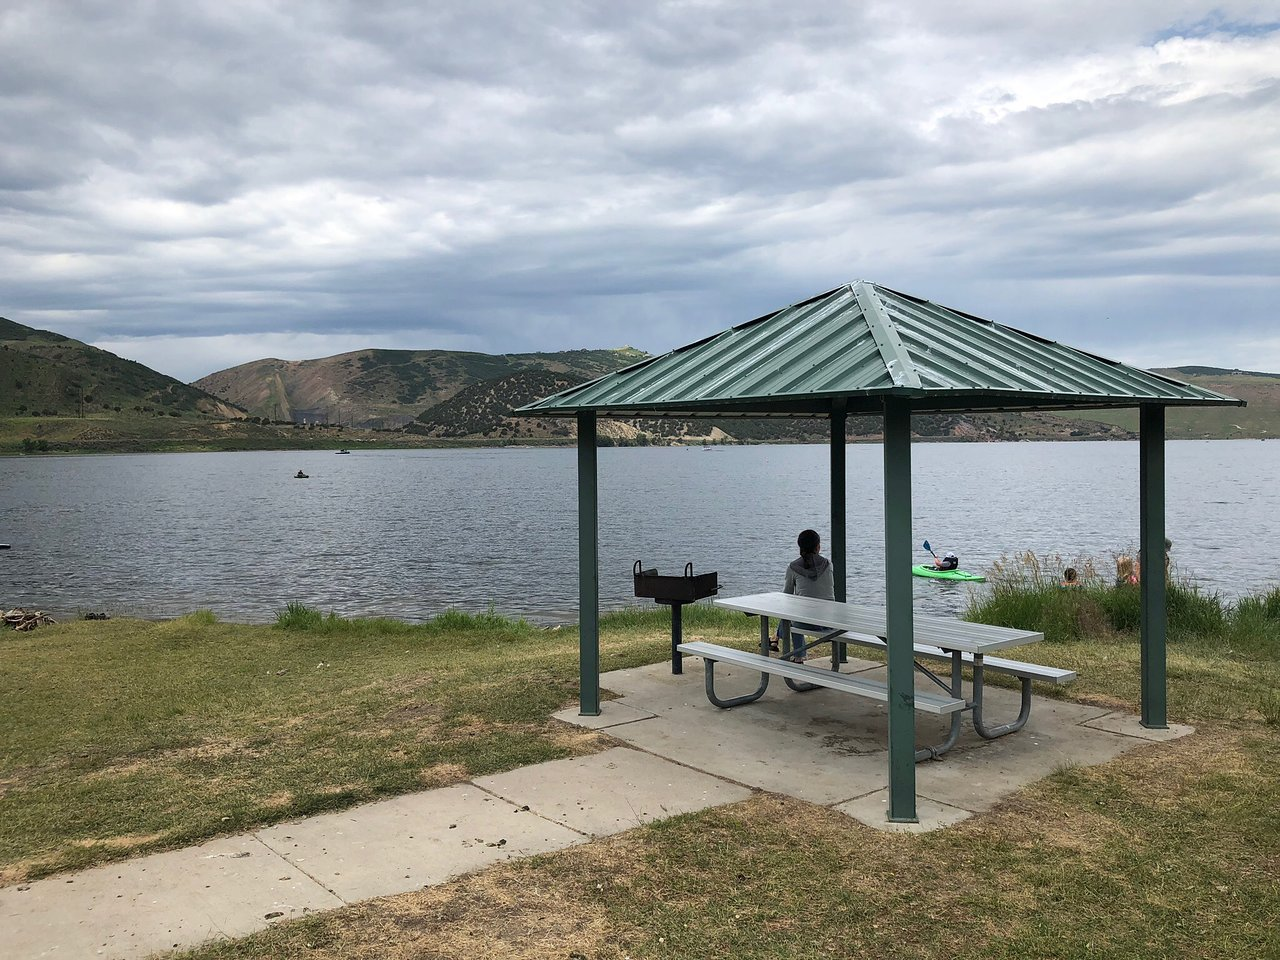 Rockport State Park (Peoa) 2020 All